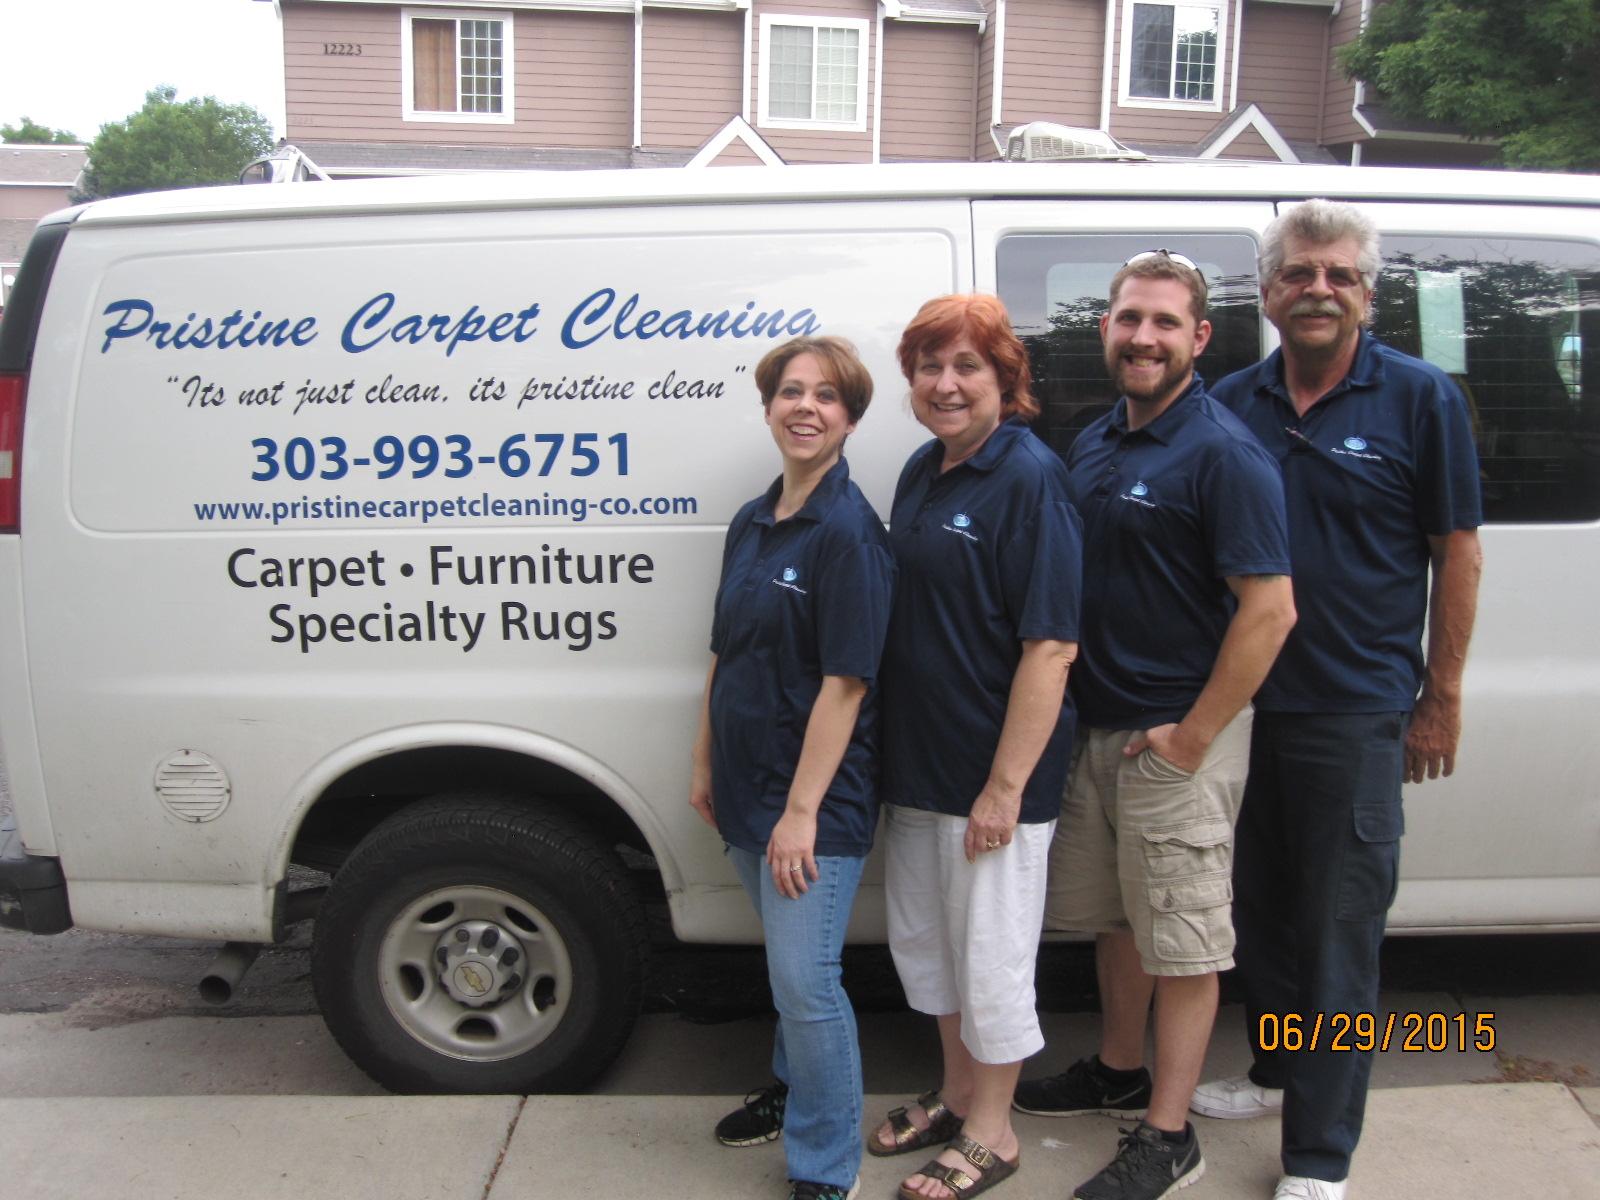 Pristine Carpet Cleaning image 14